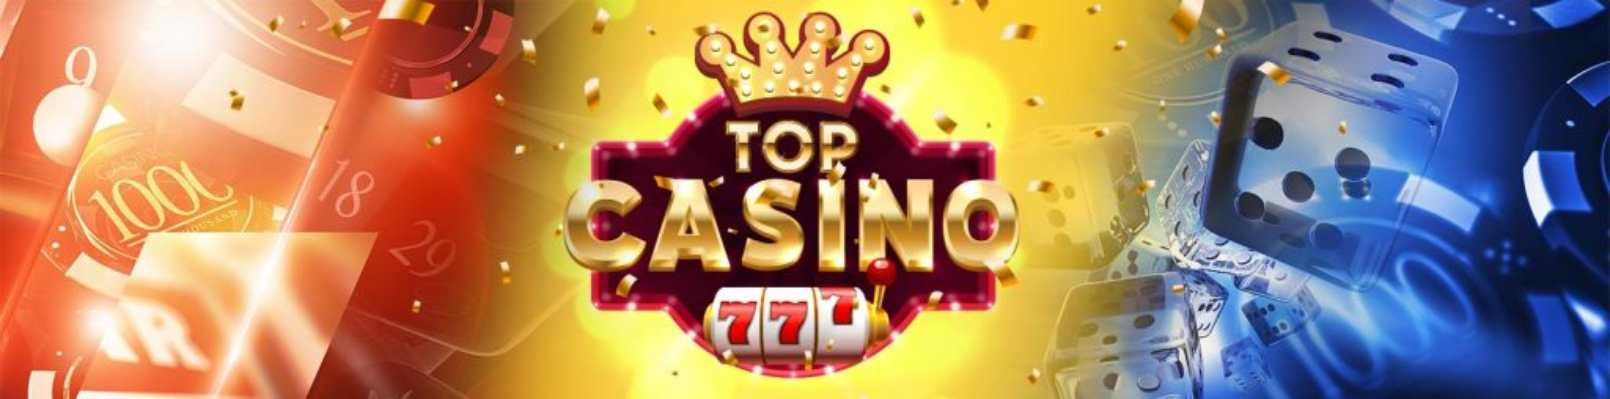 top casino online jocuri